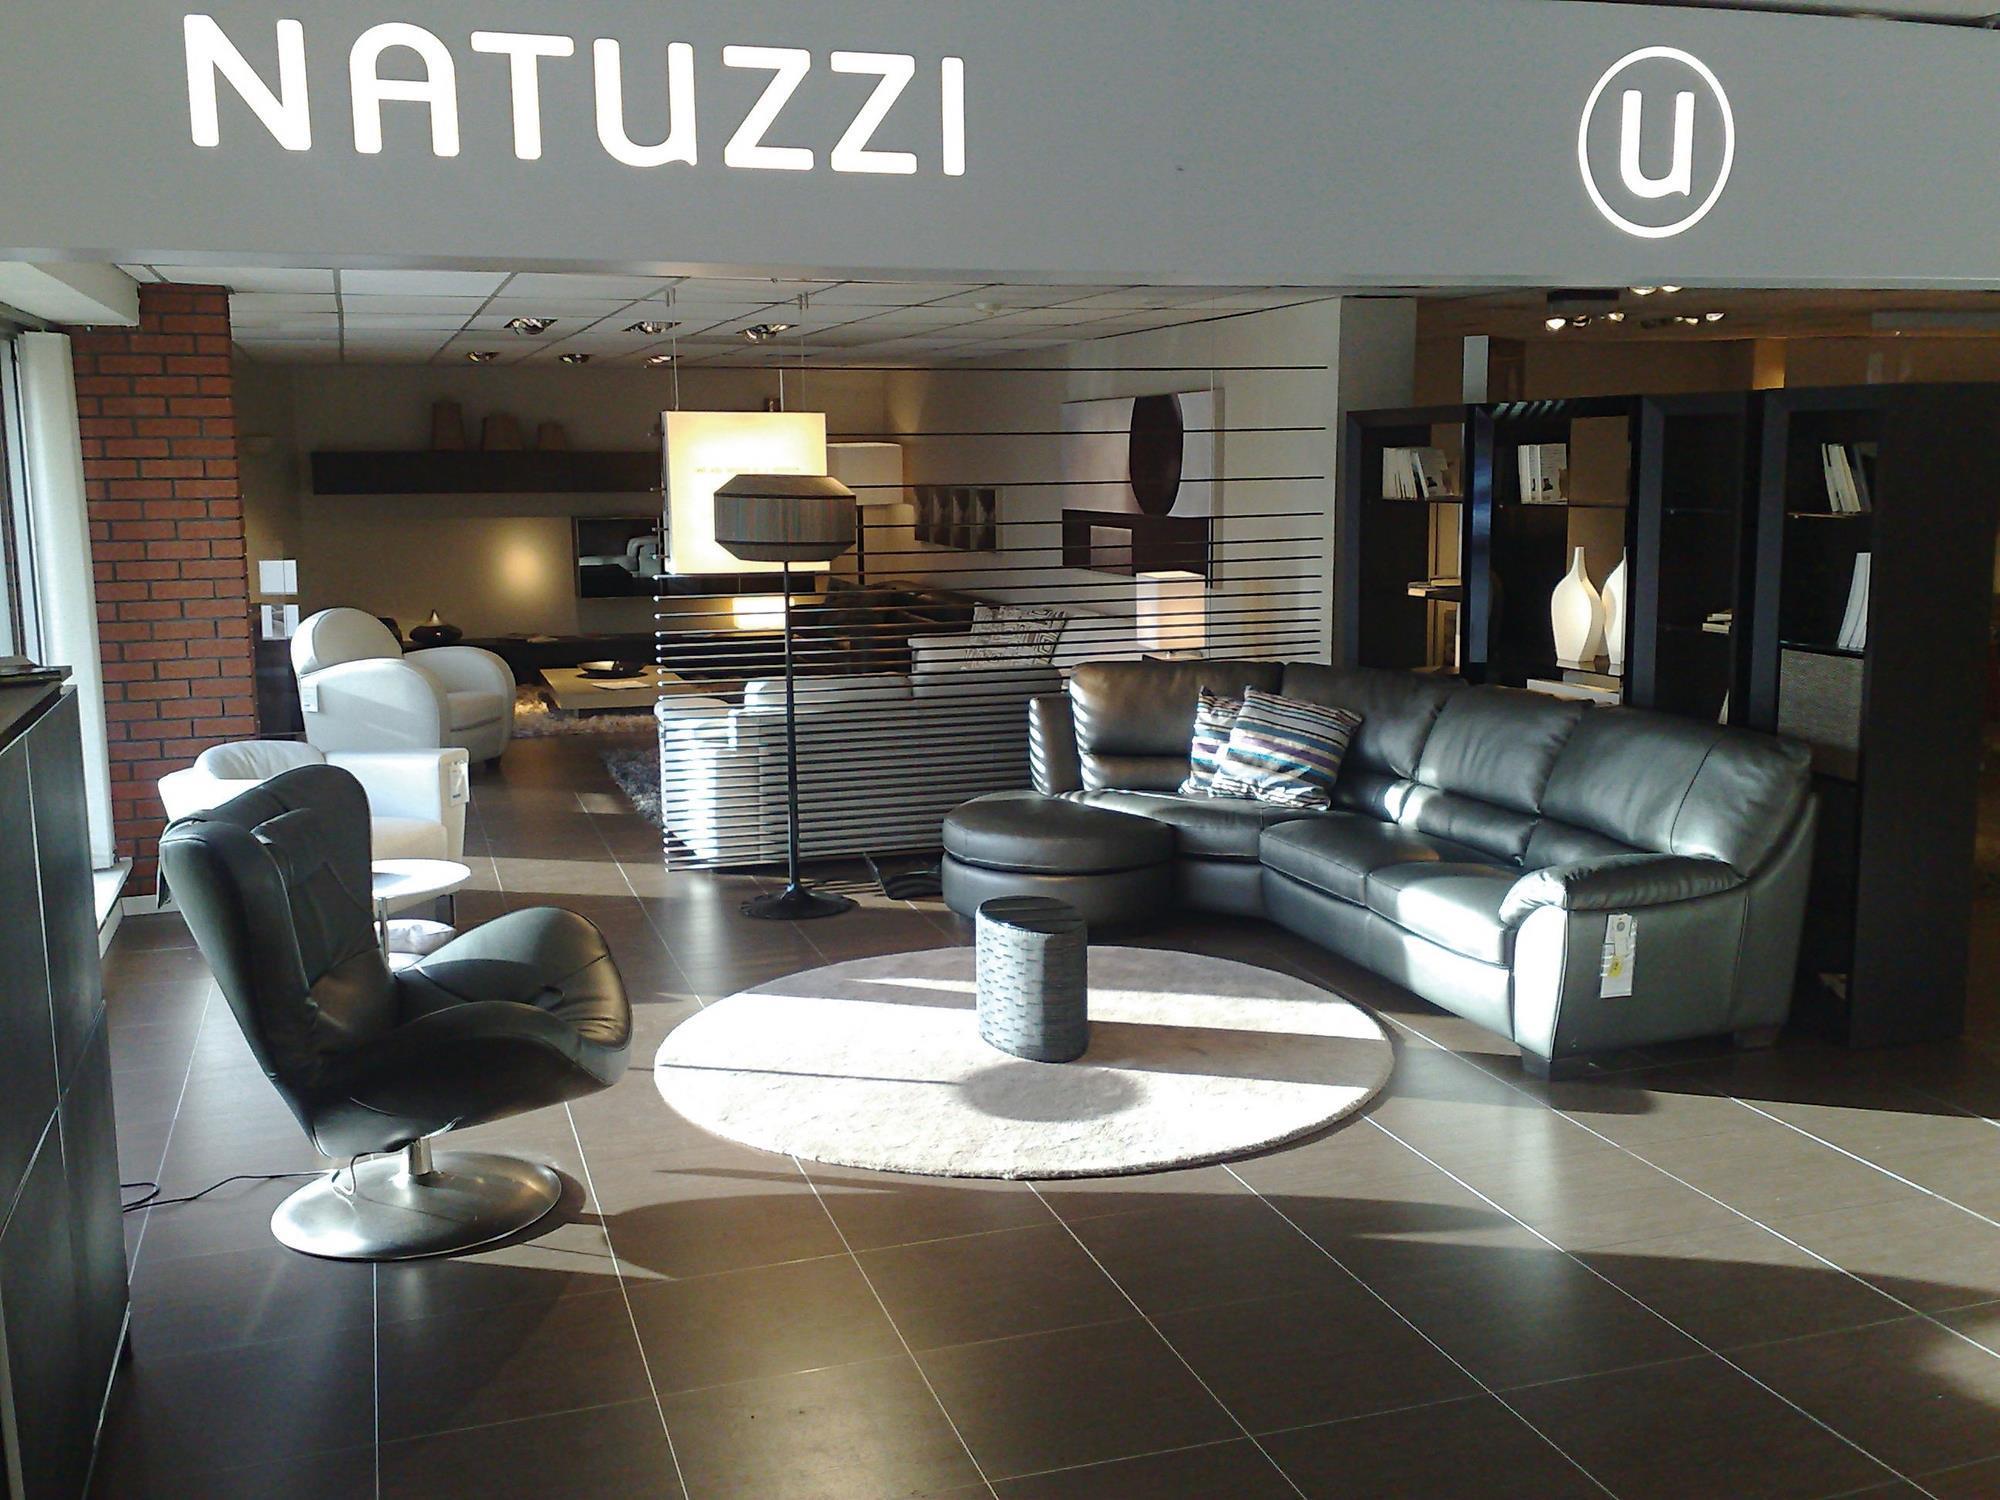 Design Bank Natuzzi.Natuzzi Accused In Price Fixing Case News Retail Week